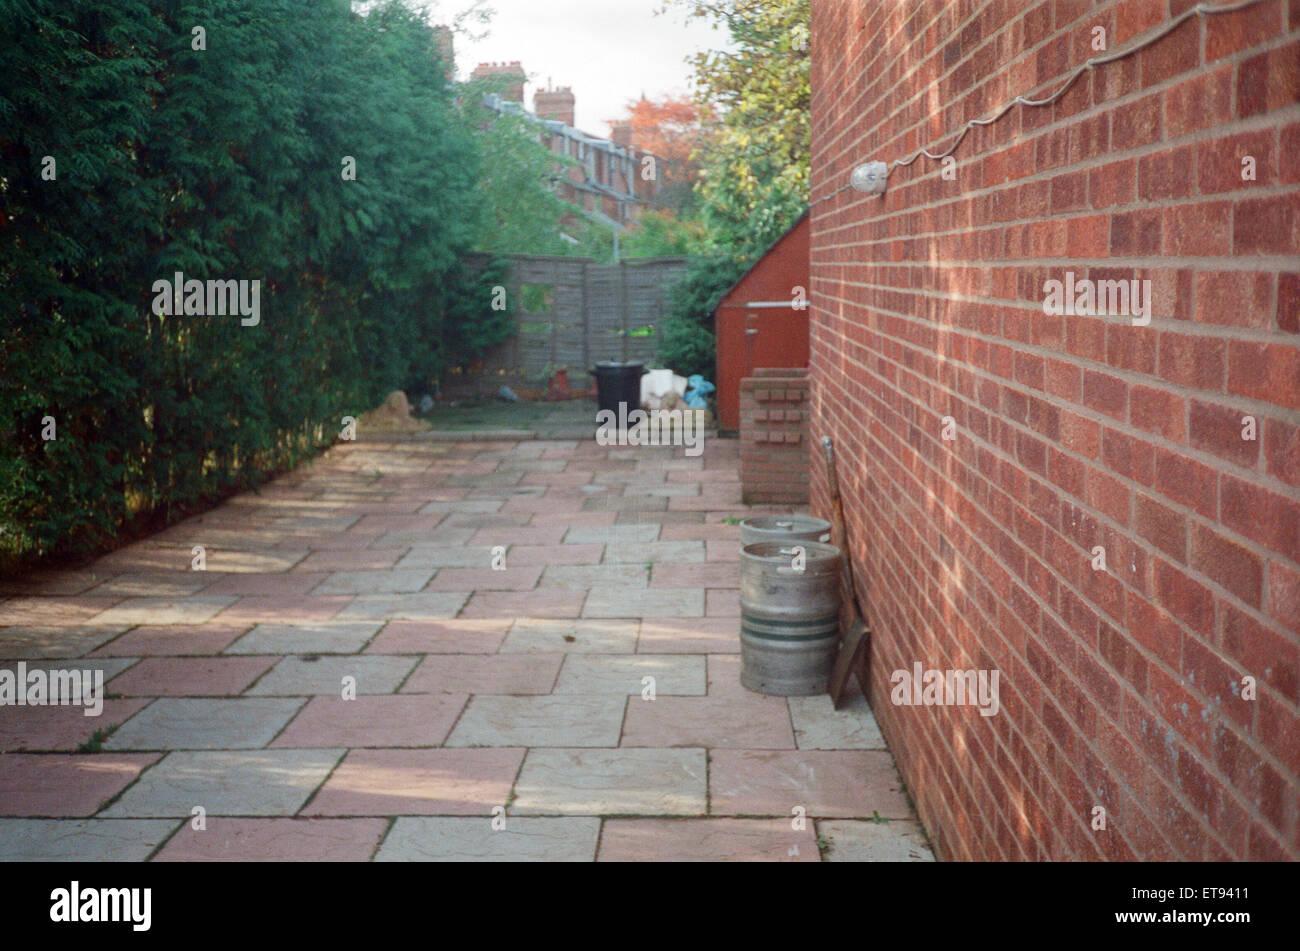 Exterieur der 25 Cromwell Street, Gloucester. Frederick West der Massenmord angeklagt. 3. März 1995. Stockfoto